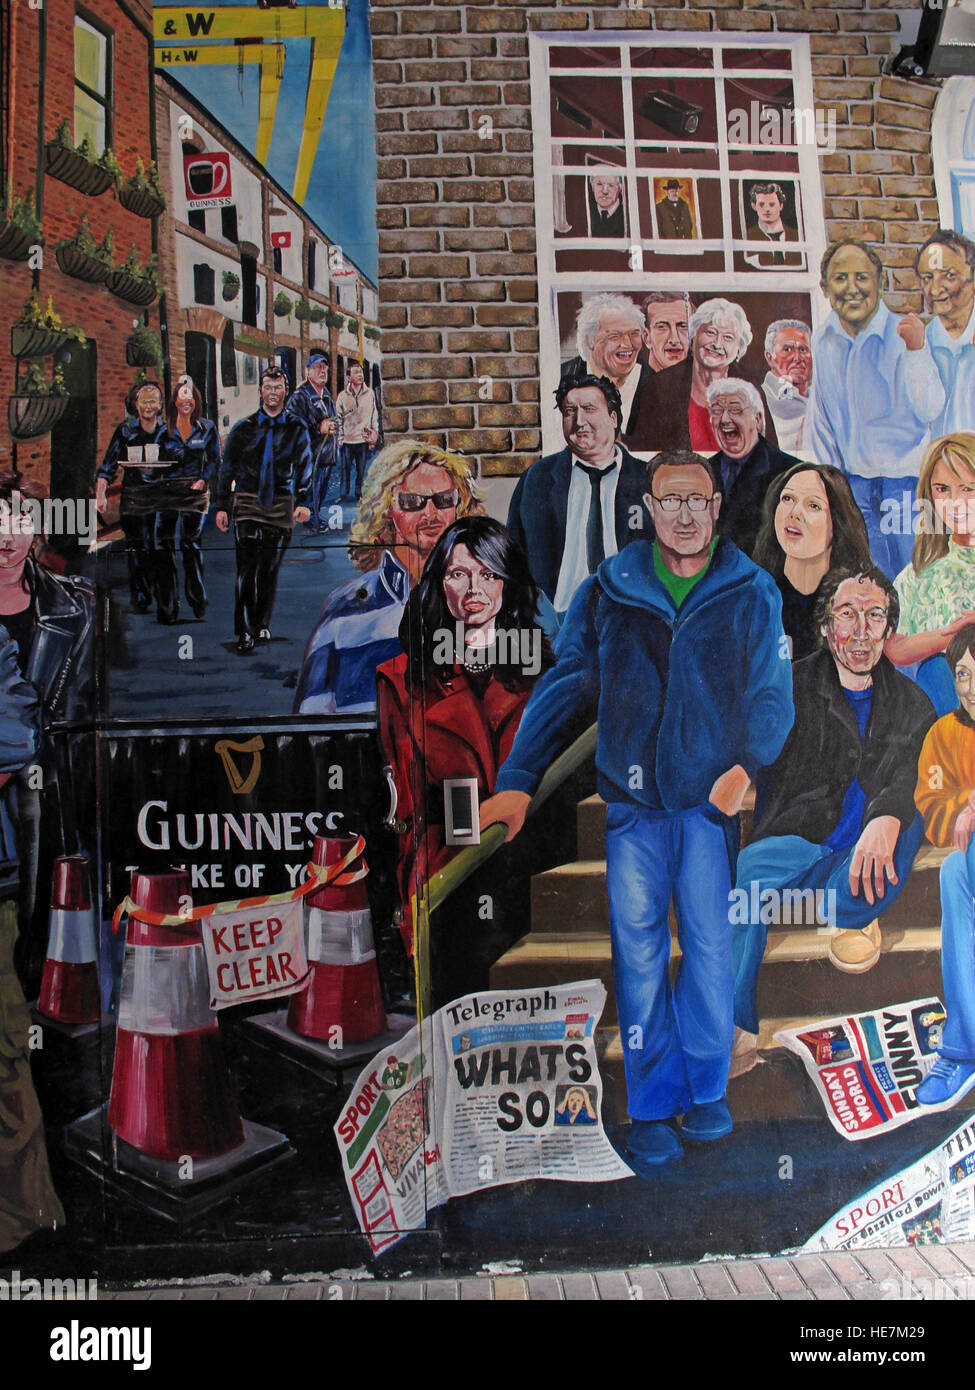 Laden Sie dieses Alamy Stockfoto Duke Of York Pub, Belfast - Titanic Wandbild Kunstwerke berühmter Iren - HE7M29